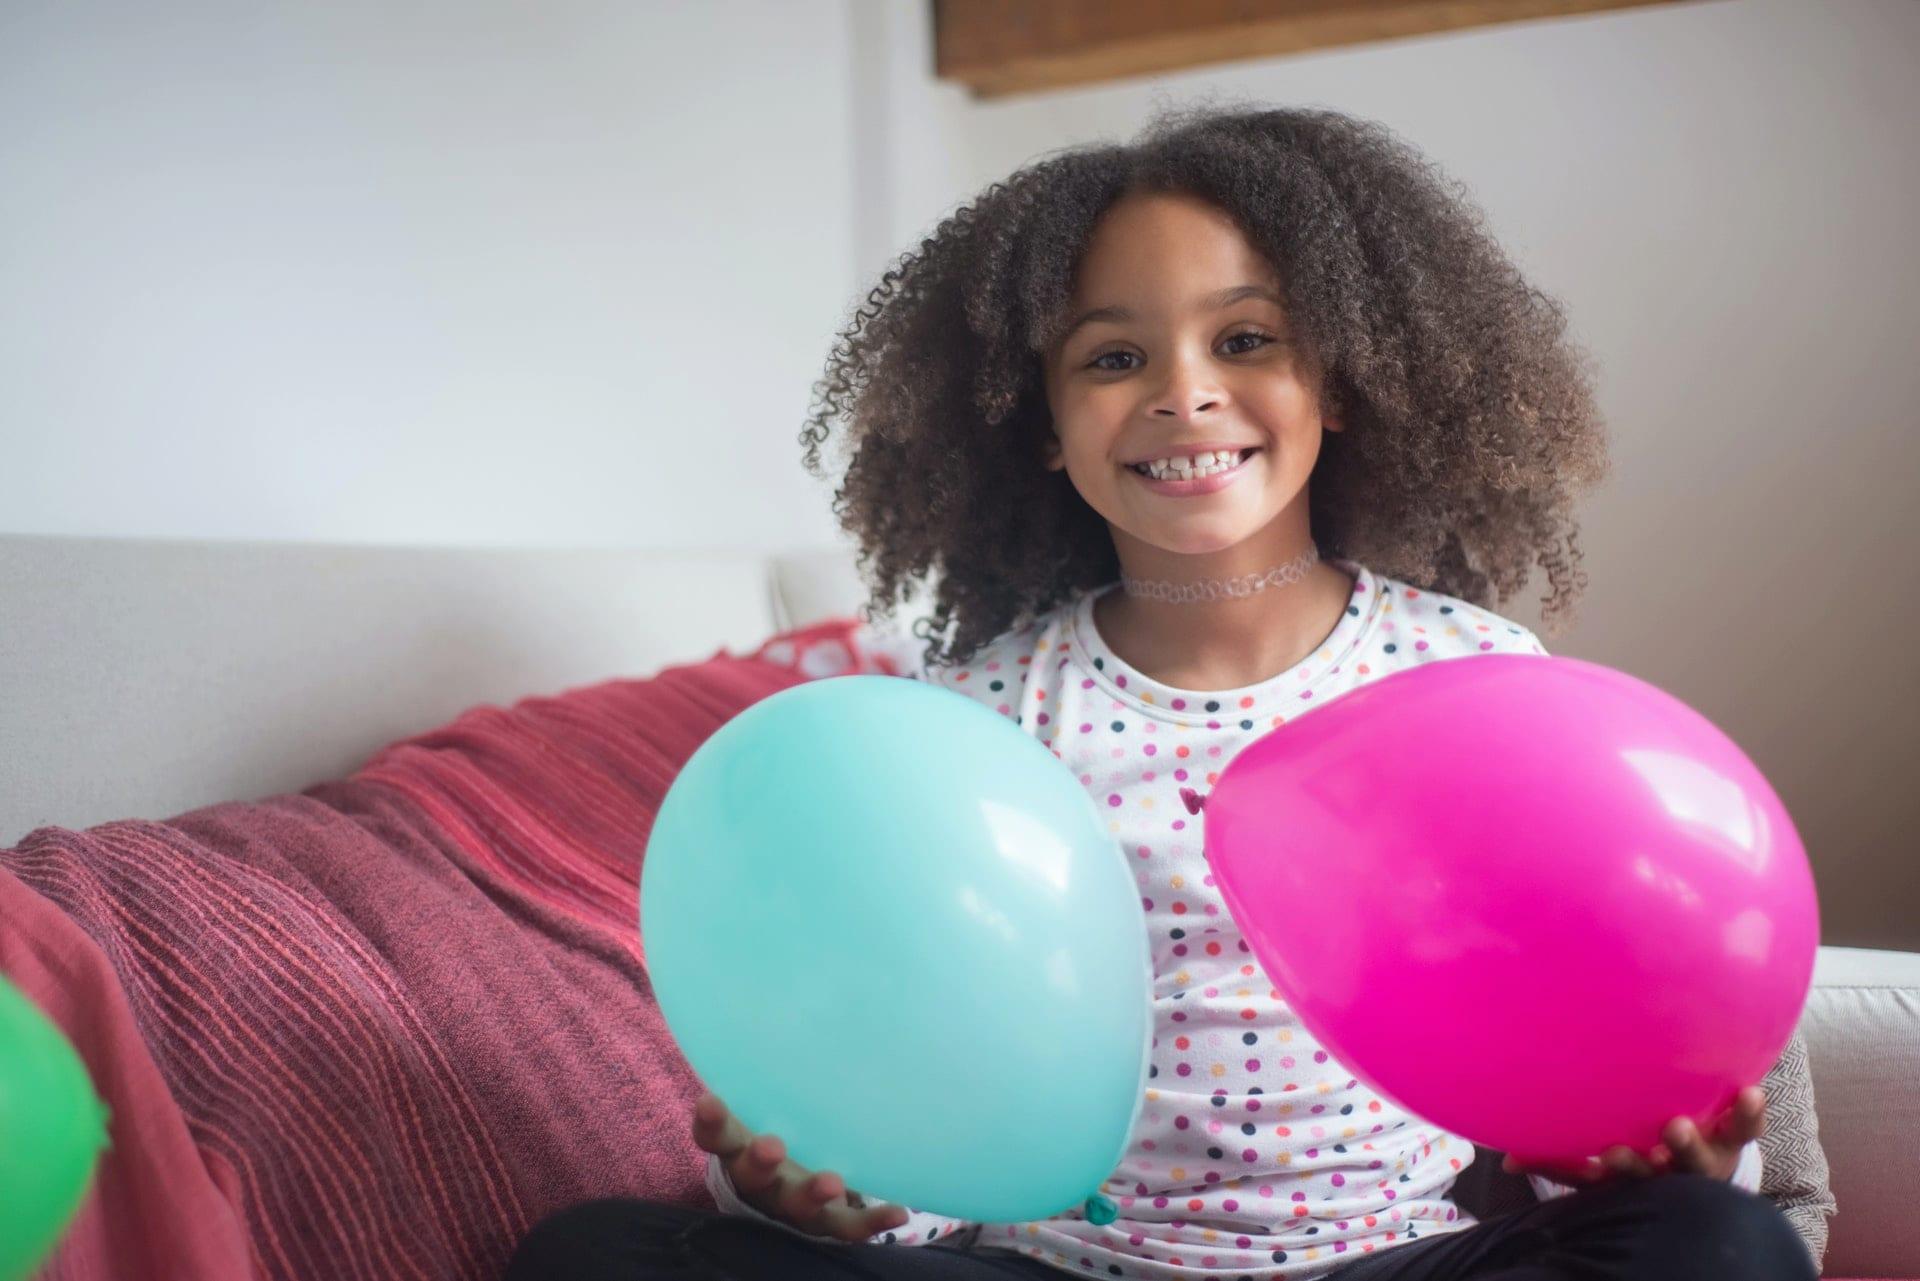 tween girl smile